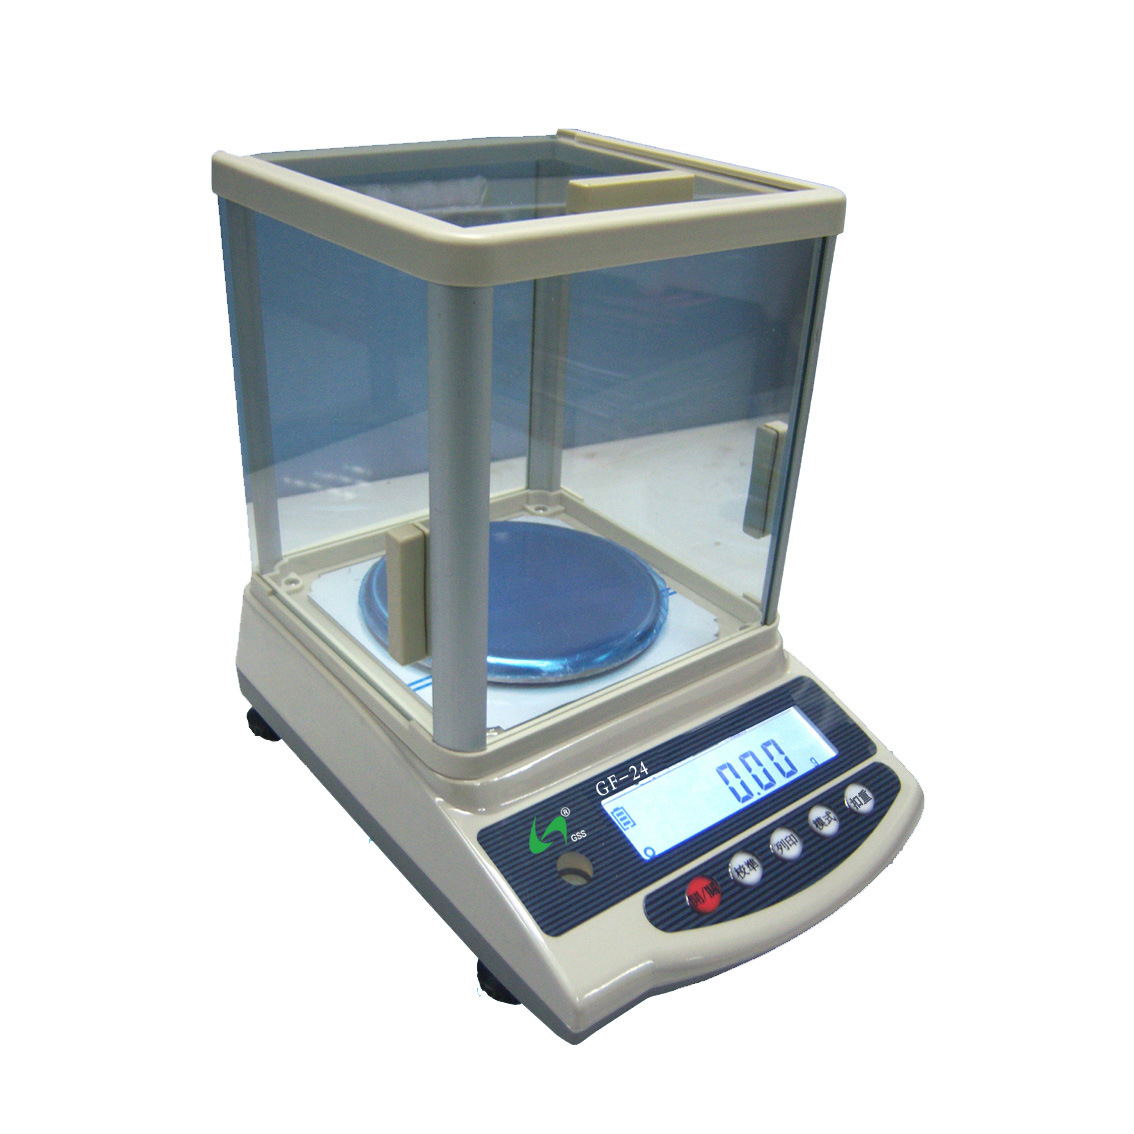 China Electronic High Precision Balance for Laboratory 1200g (GF ... for Balance Laboratory Apparatus  53kxo